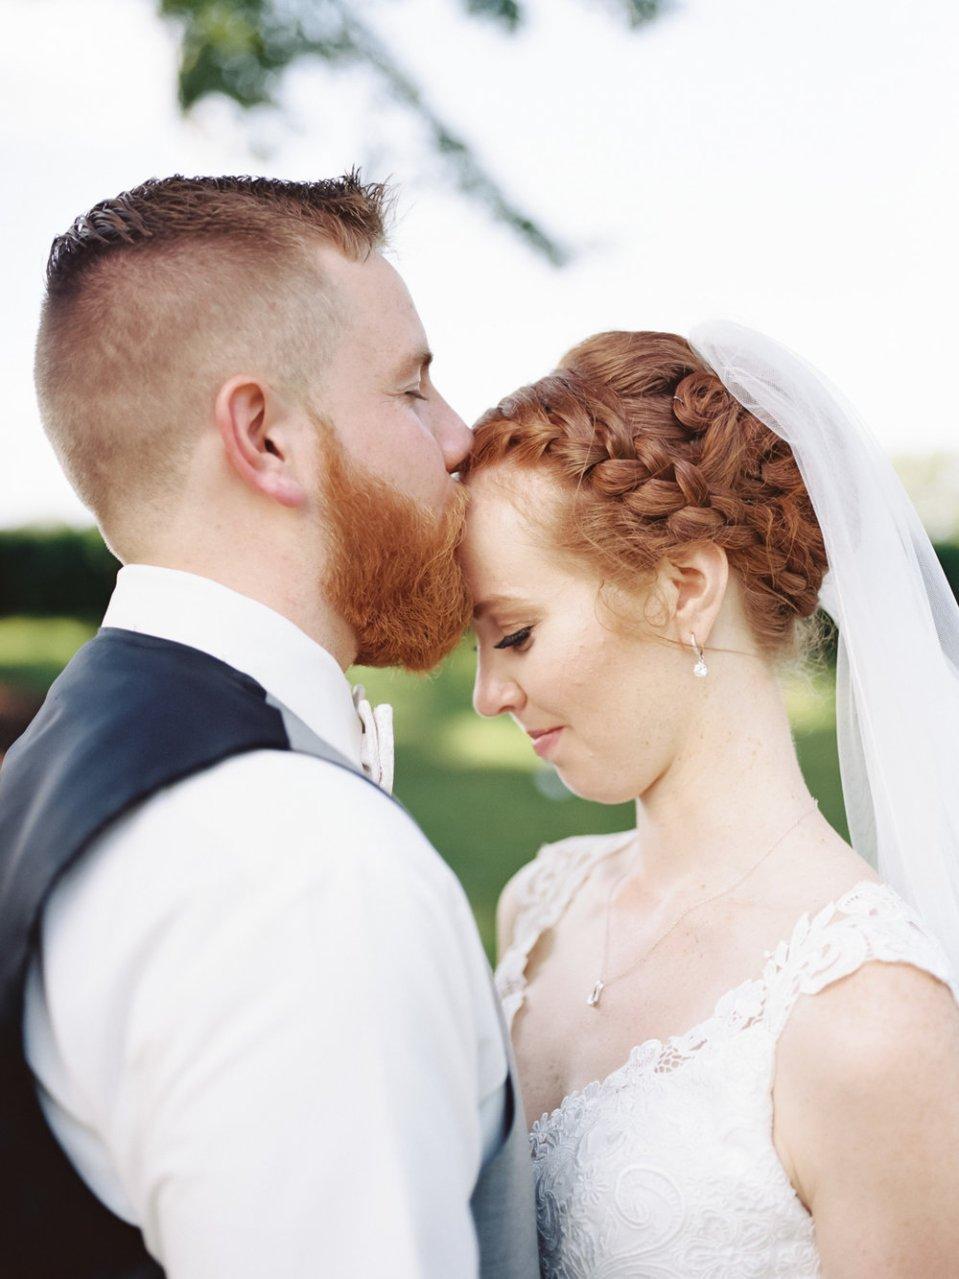 Romantic Summer Wedding in Ashland Ohio-26.jpg